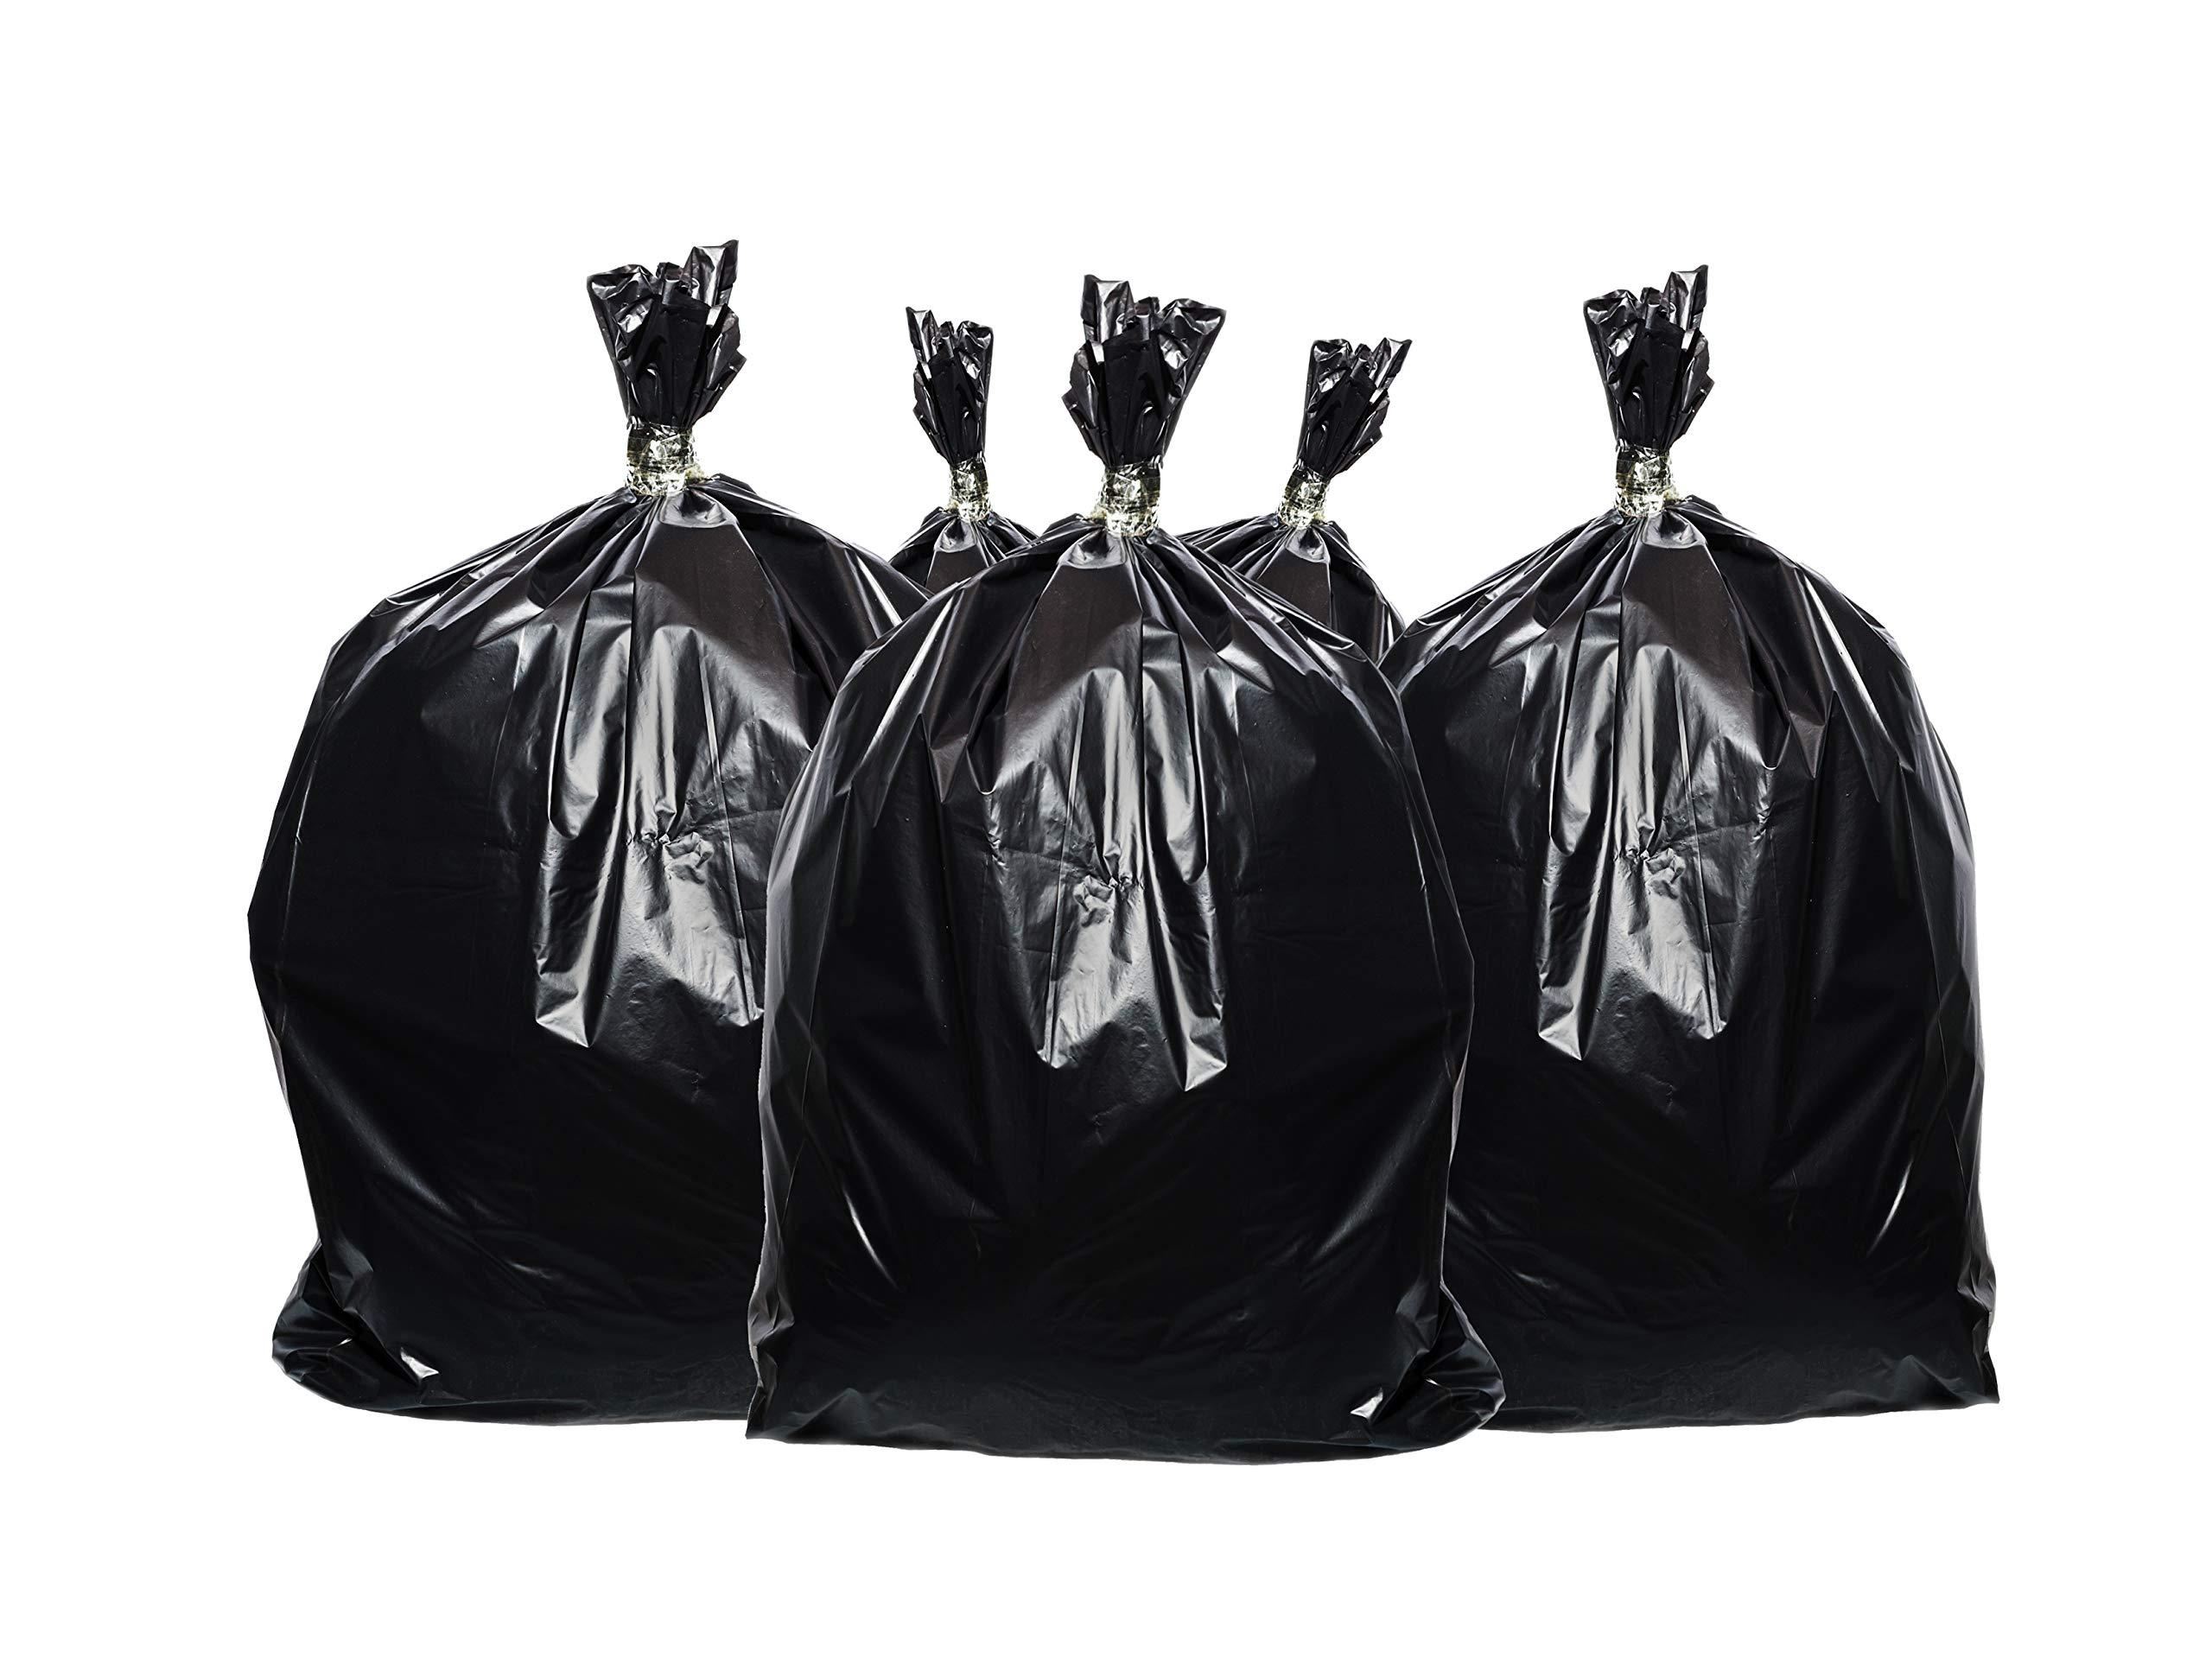 Toughbag 95 Gal Trash bags, Black, 2 Mil, 61x68, 25 Garbage Bags Per Case by ToughBag (Image #7)